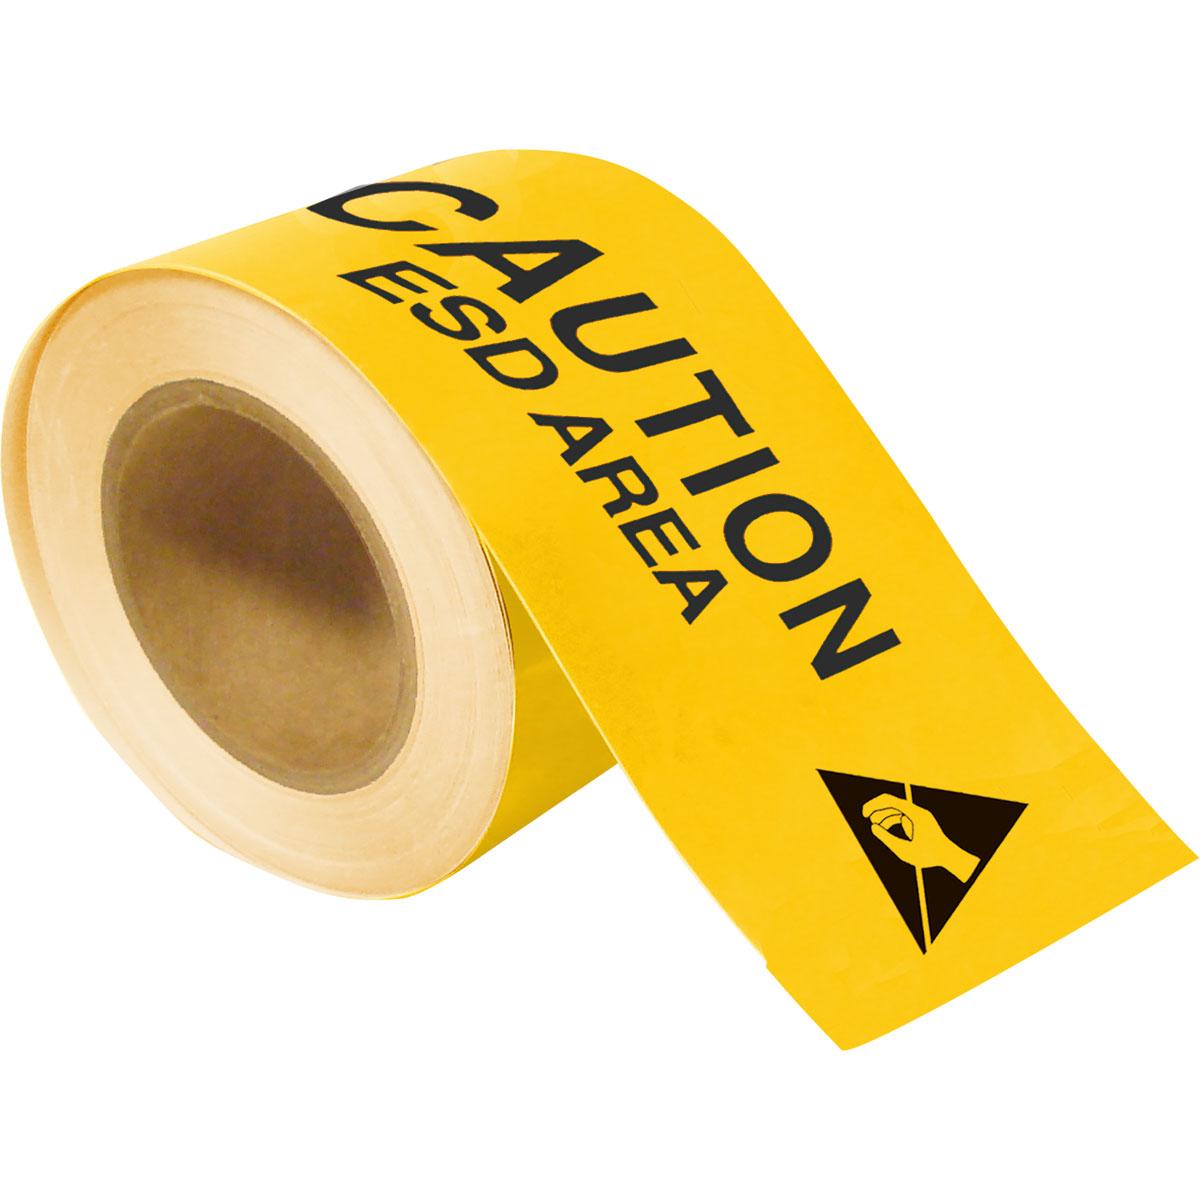 Part 121369 ToughStripe CAUTION ESD AREA 4 X100 39 Yellow Floor